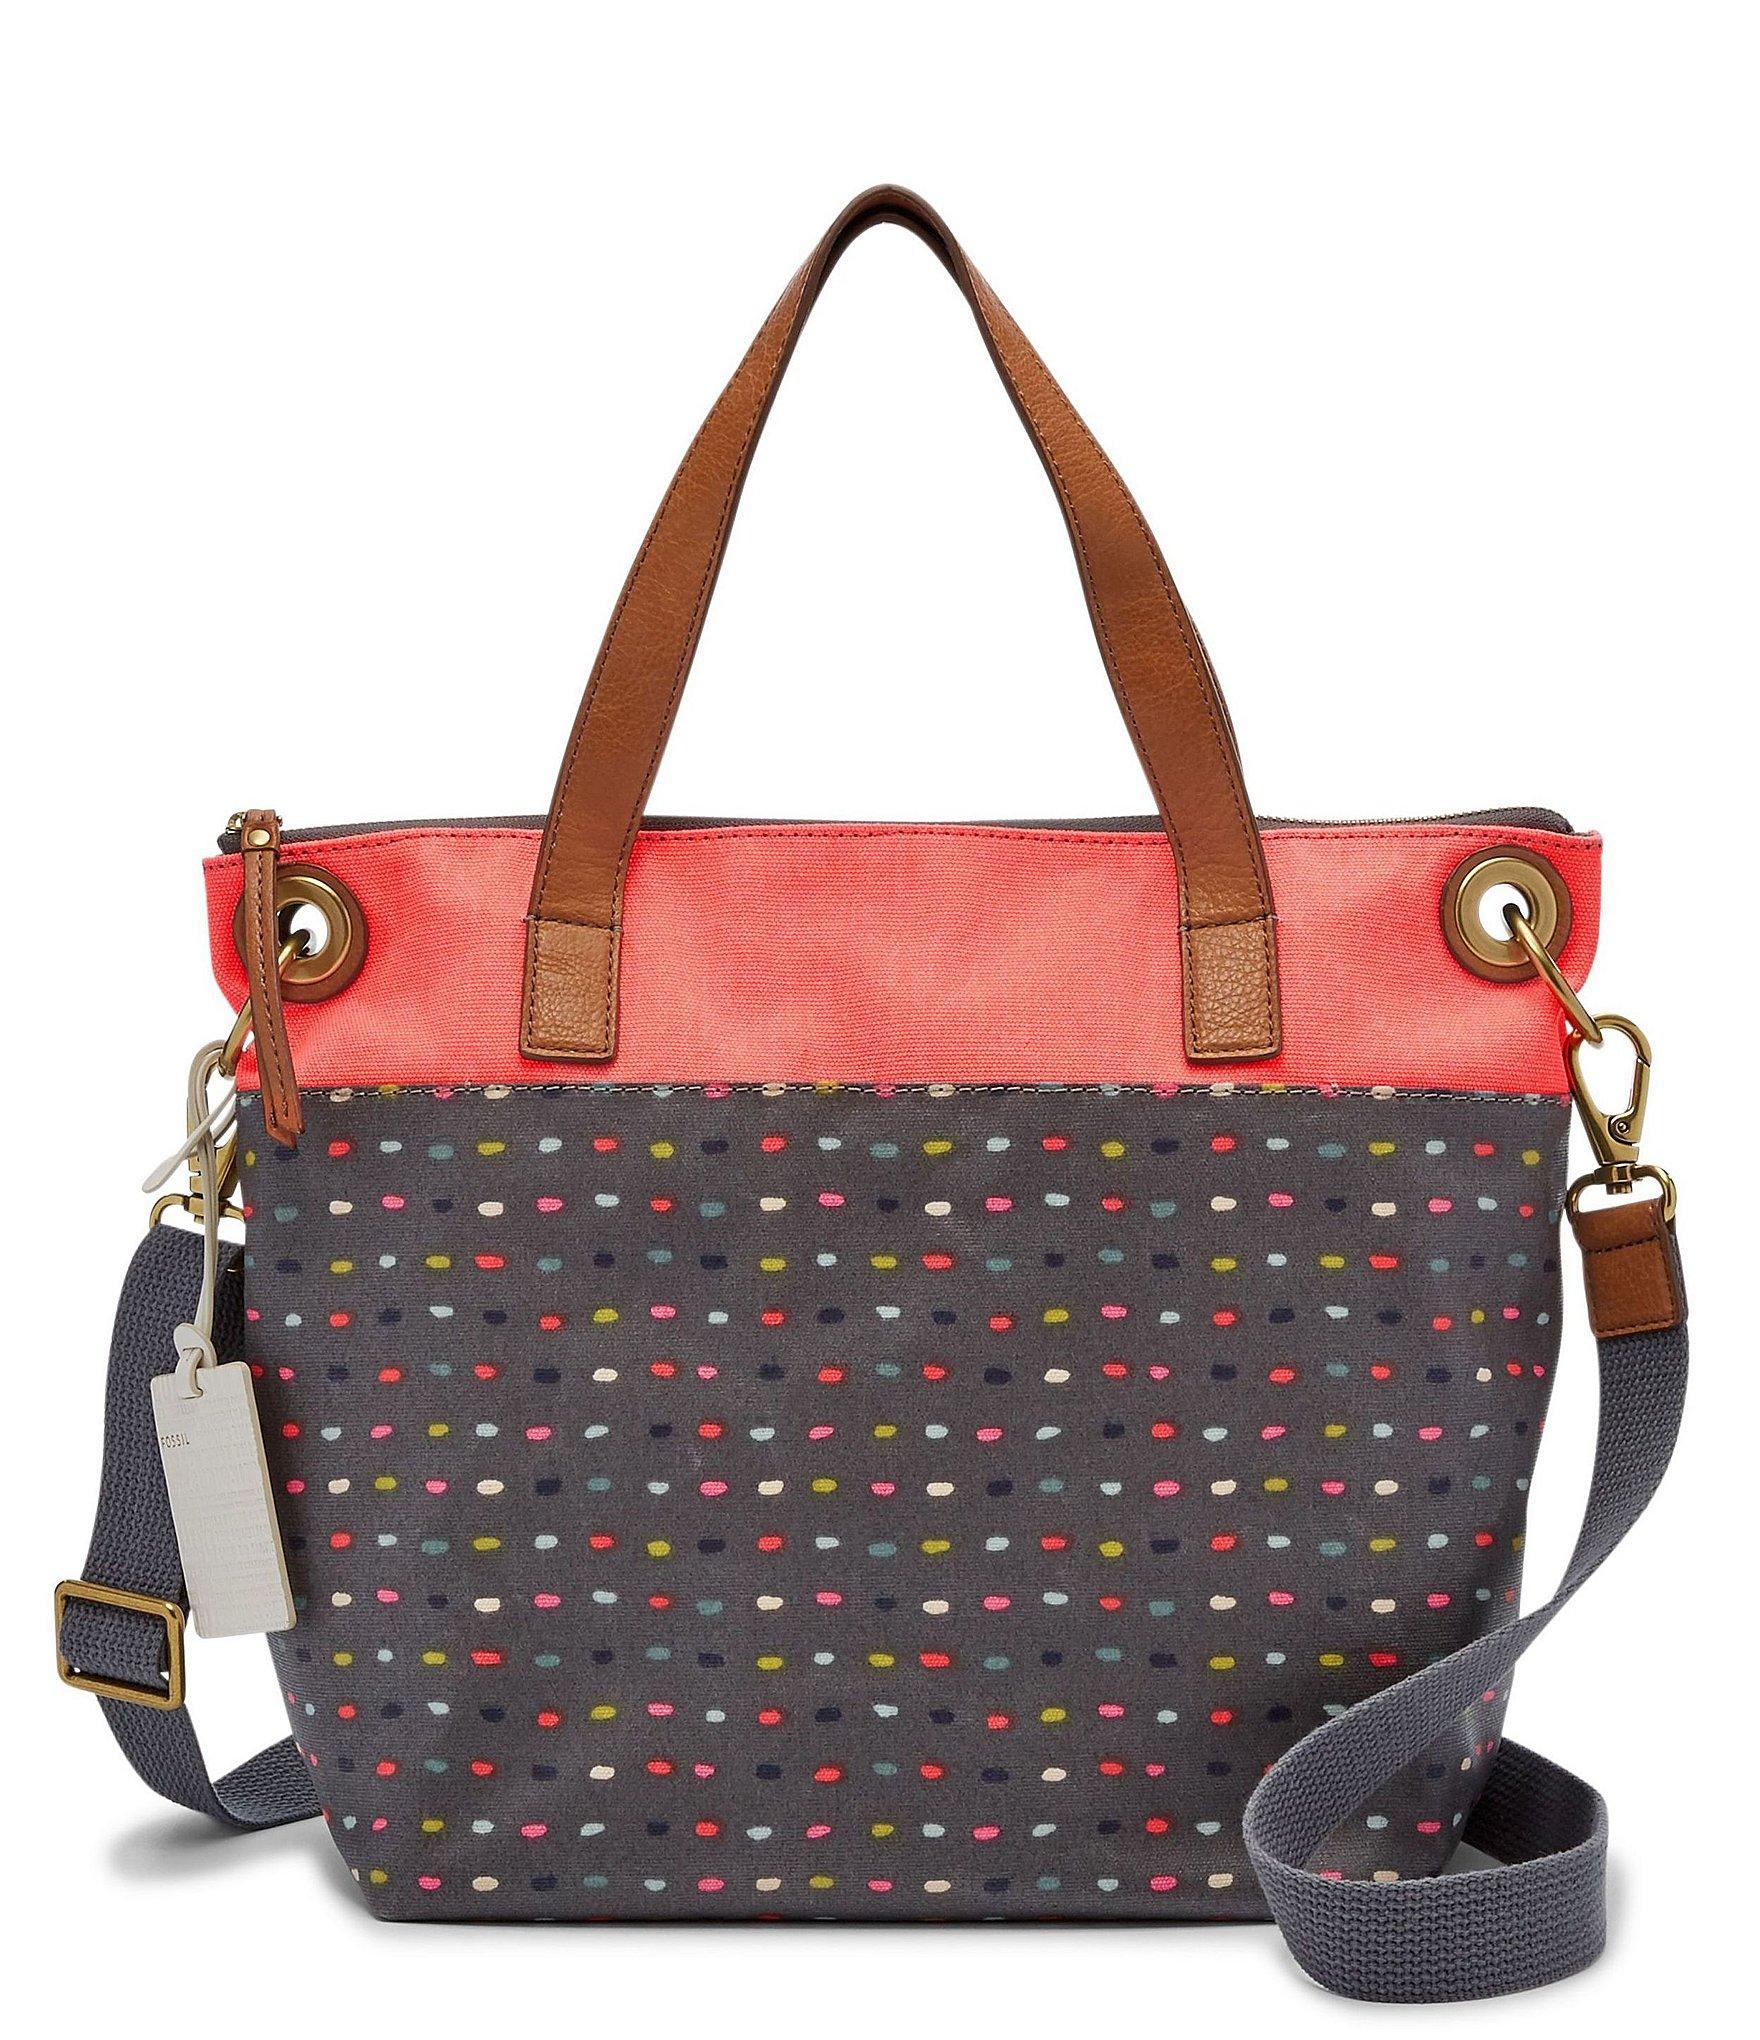 Fossil Keyper Shopper Berry Shb 1132844 Daftar Harga Barang Maya Small Hobo Crimson Zb 6979933 Backpack Grey Floral Shb1343919 Multicolor Source Gallery